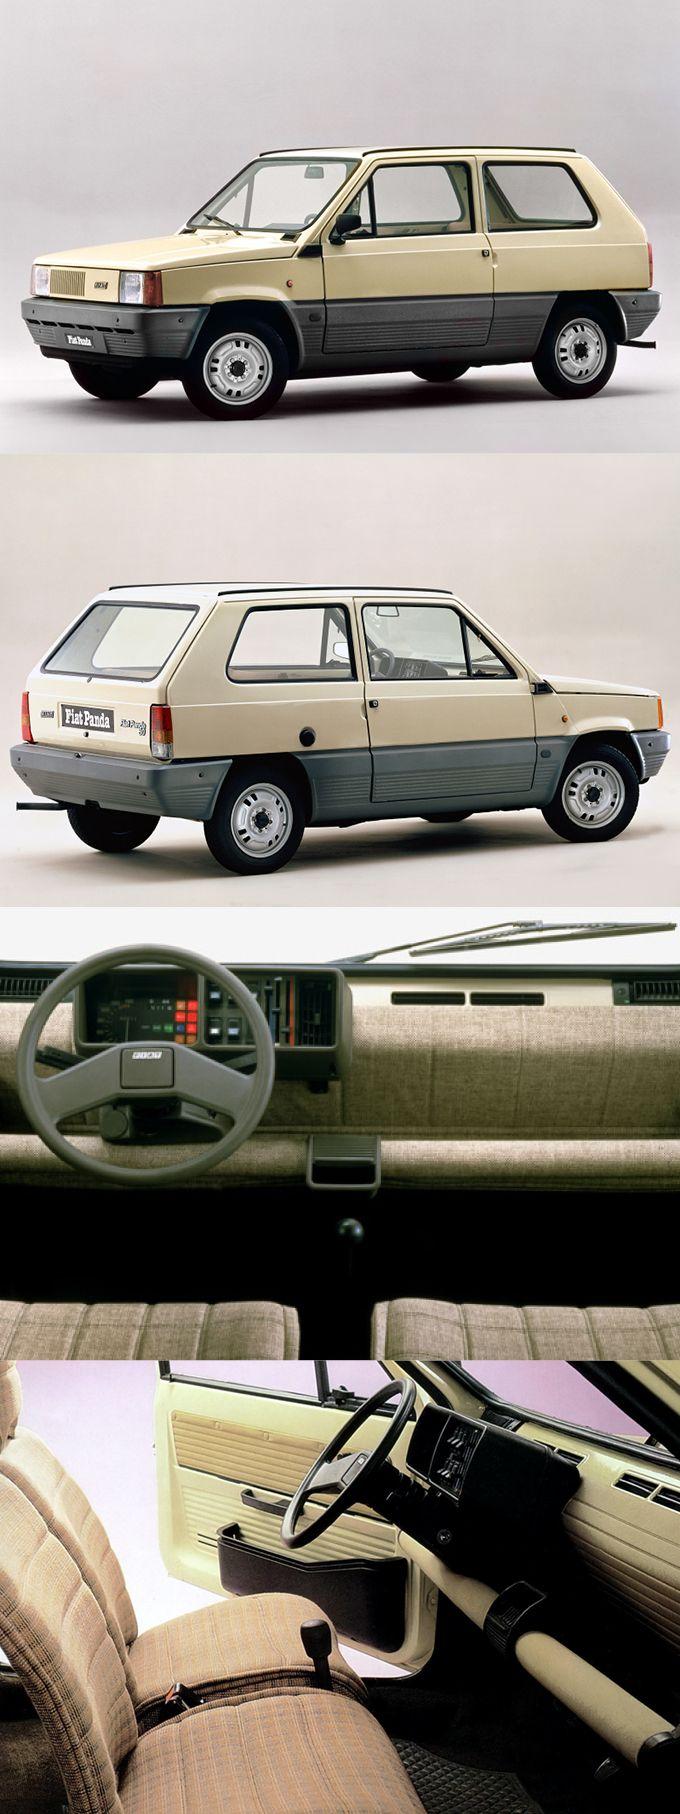 1980 fiat panda 141 italy beige